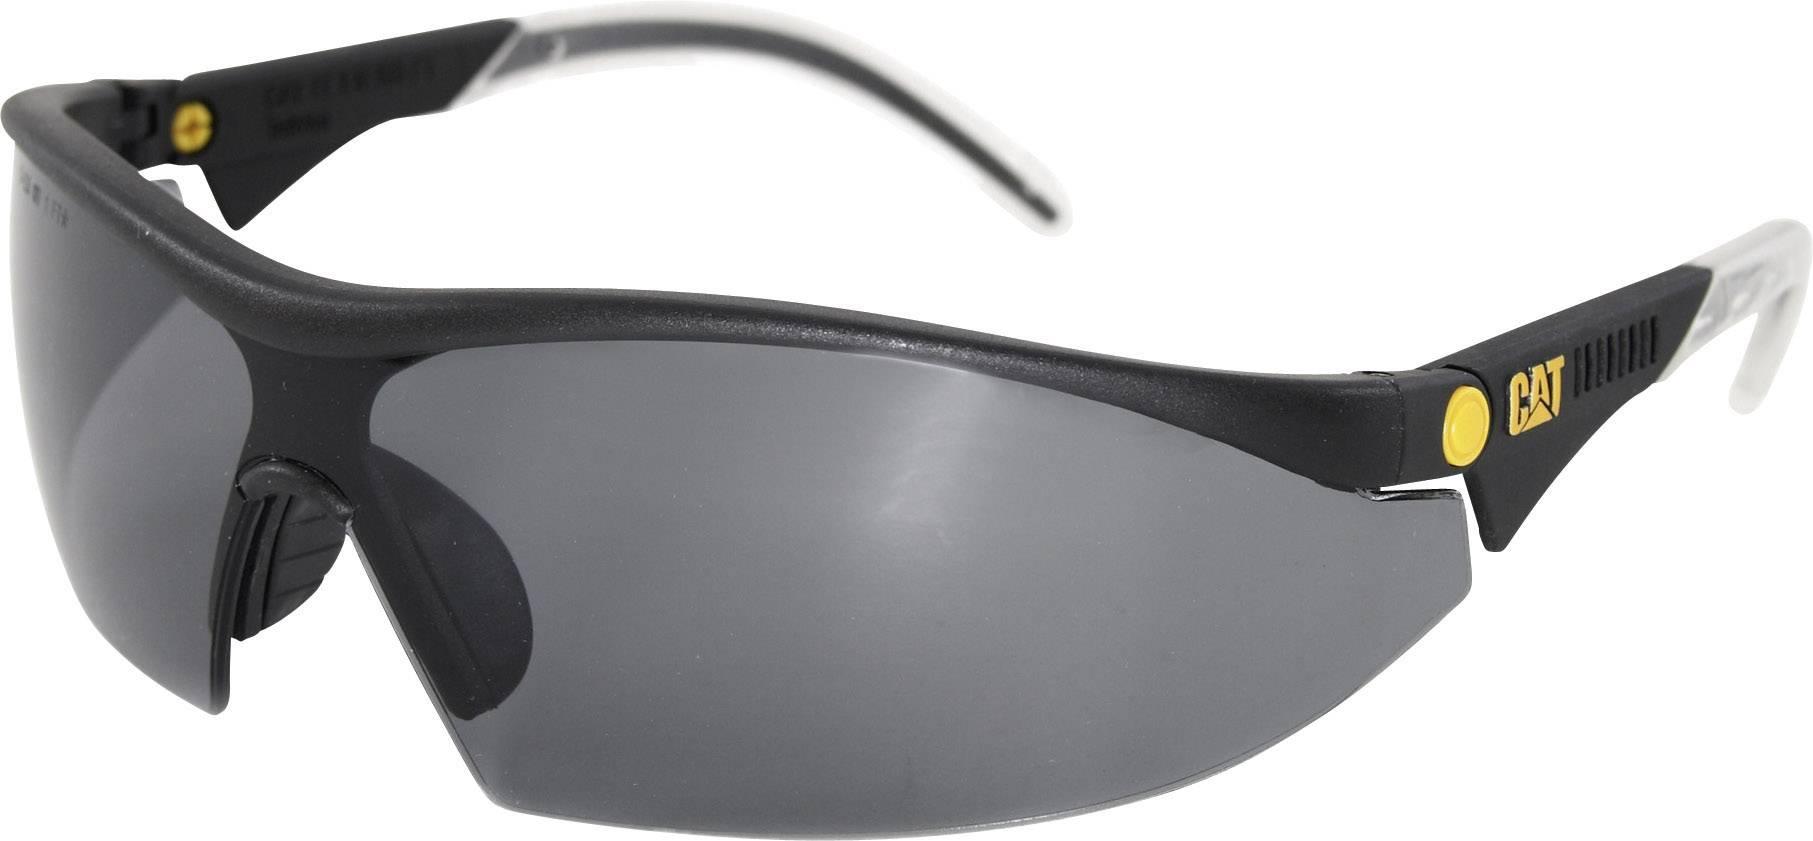 Ochranné brýle CAT Digger 104, šedá